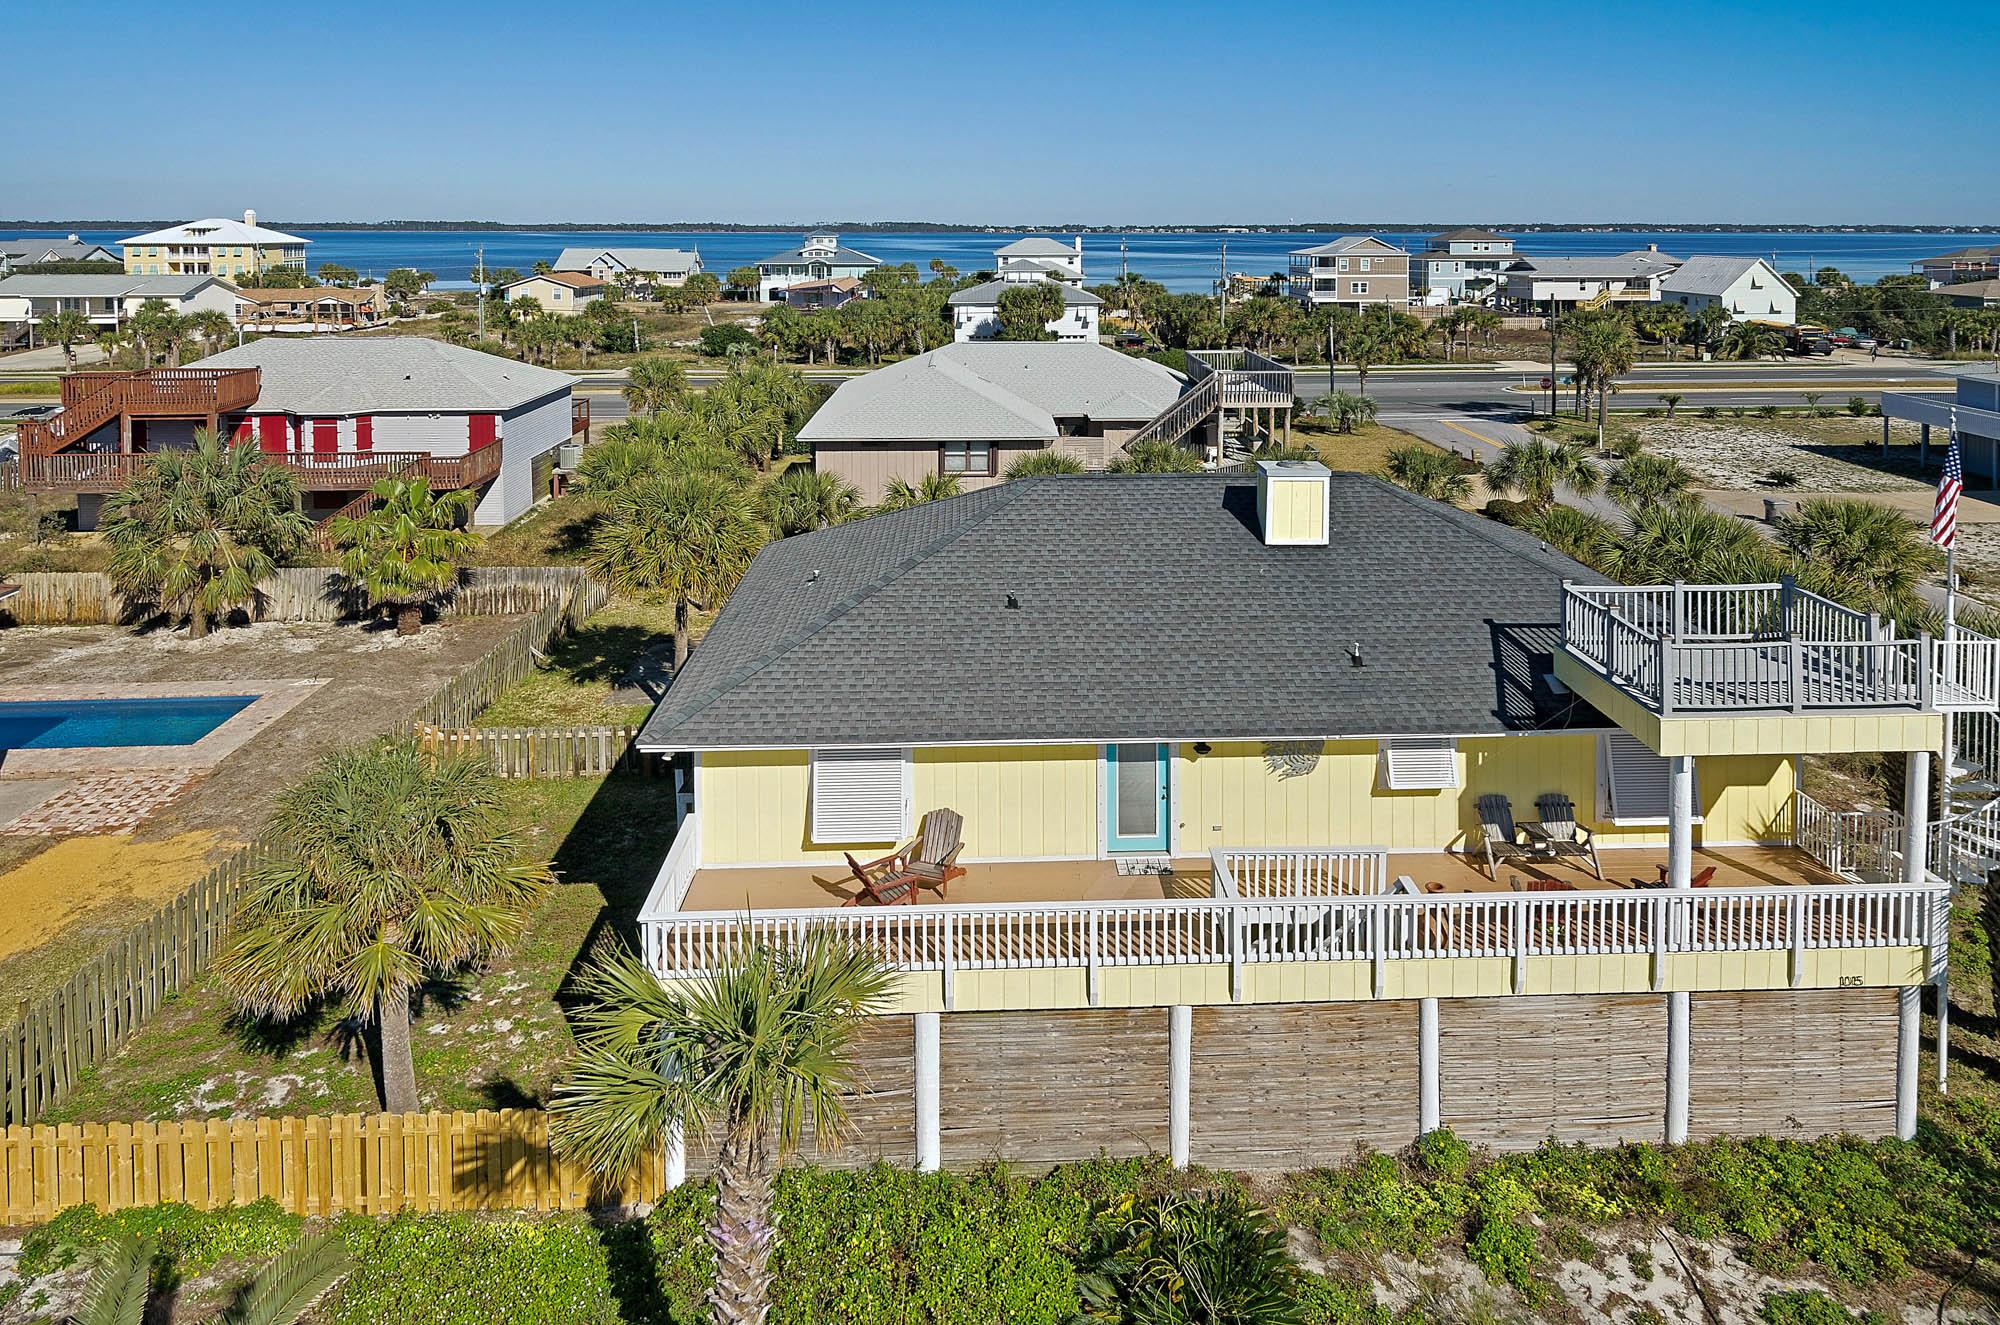 Maldonado 1015 - Sea the Big Picture House/Cottage rental in Pensacola Beach House Rentals in Pensacola Beach Florida - #39